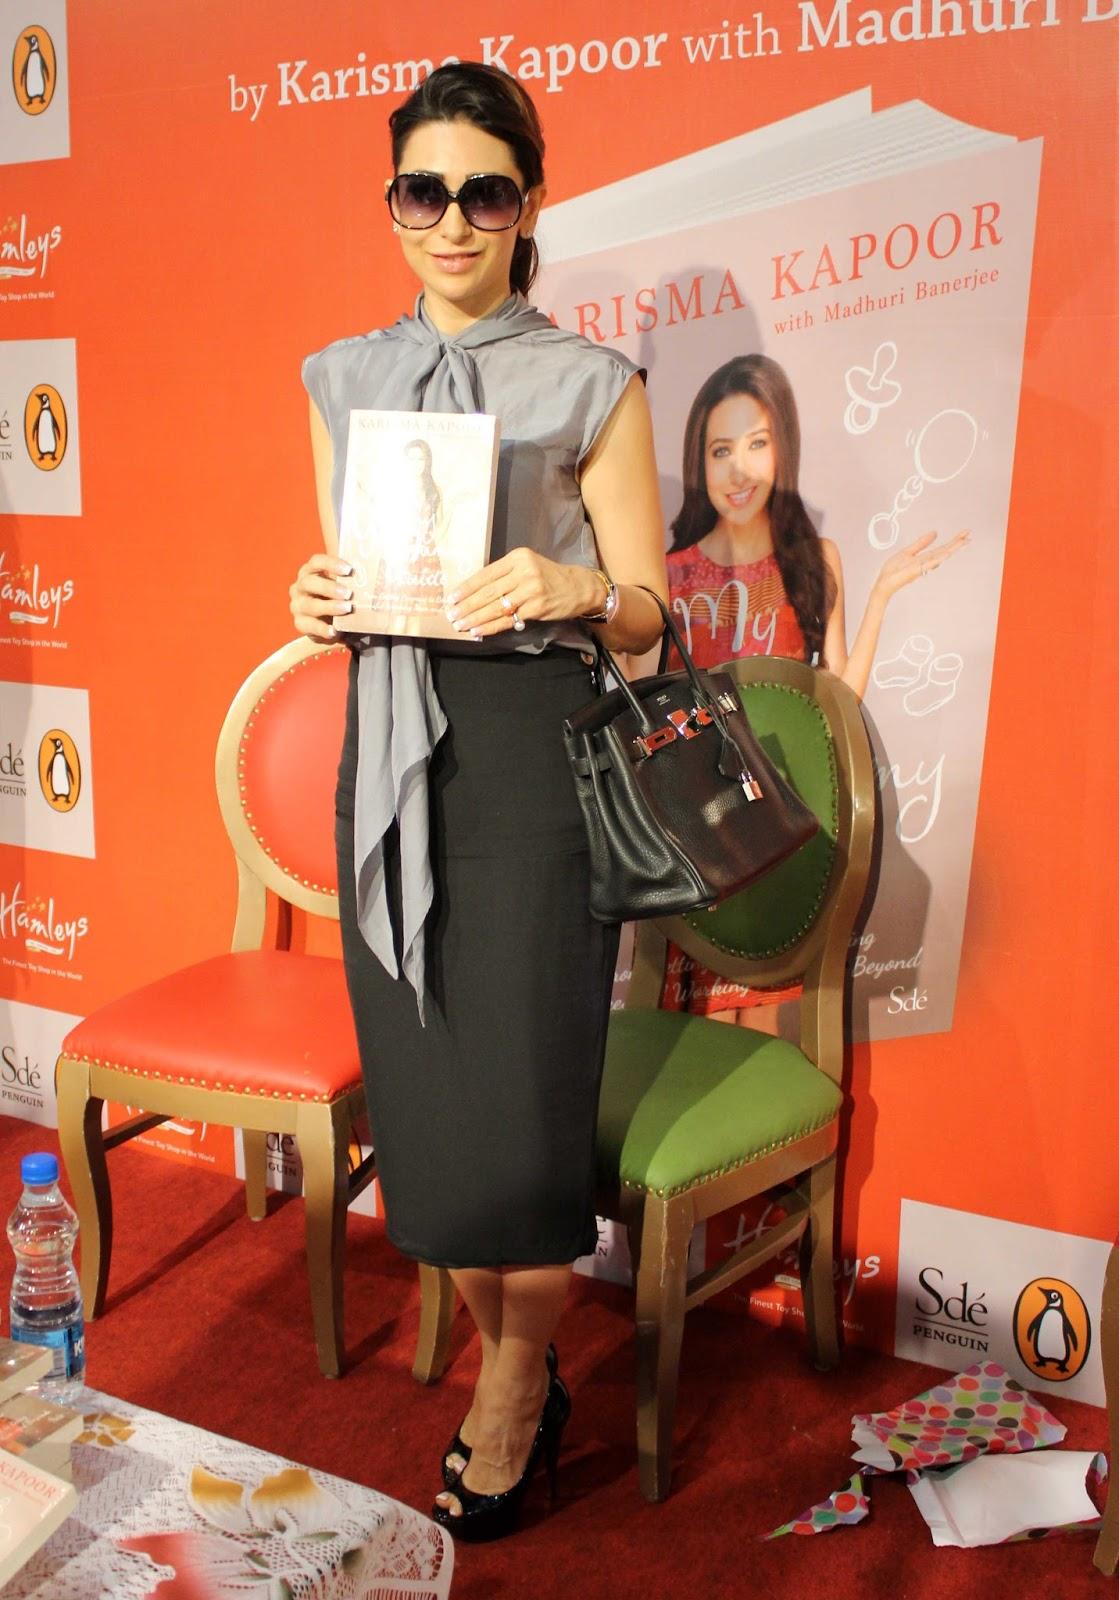 http://2.bp.blogspot.com/-P1_2rrC7sP8/Ujaxz02uiUI/AAAAAAABixw/c6uKdHGbco8/s1600/Karisma-Kapoor-Launch-Of-Book-My-Yummu-Mummy-Guide-11.JPG